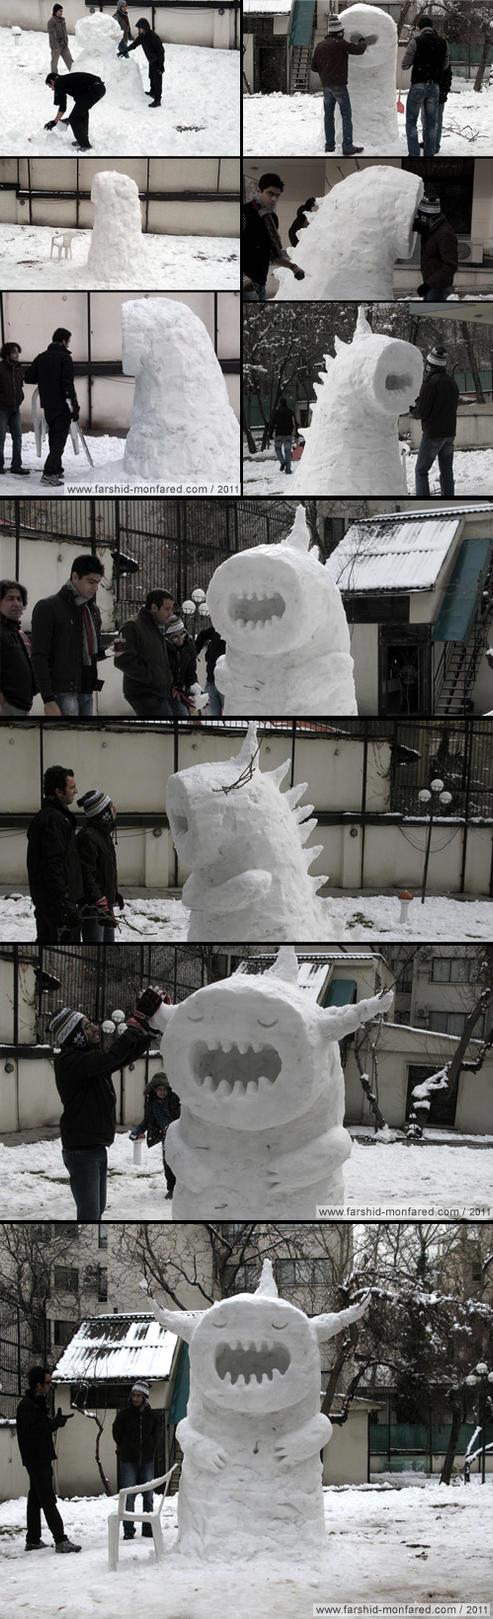 SnowPalasht by farshidf